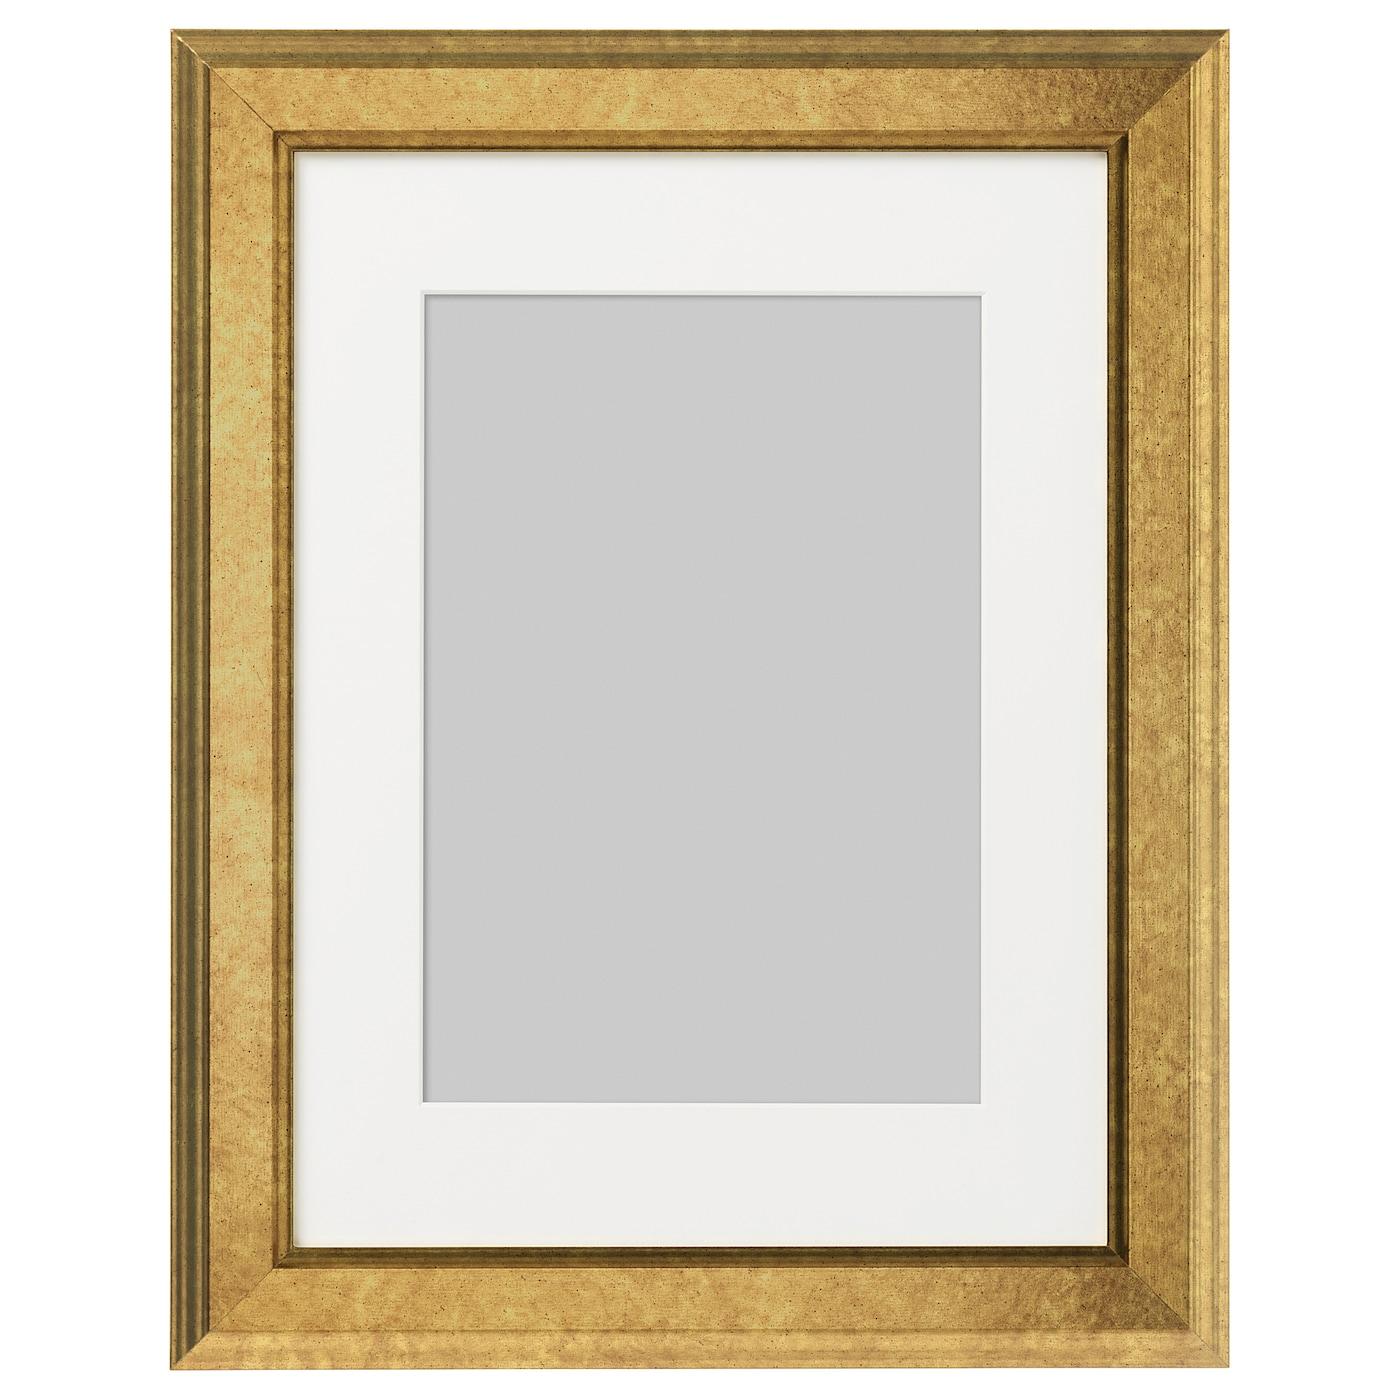 VIRSERUM Frame Gold-colour 30 x 40 cm - IKEA